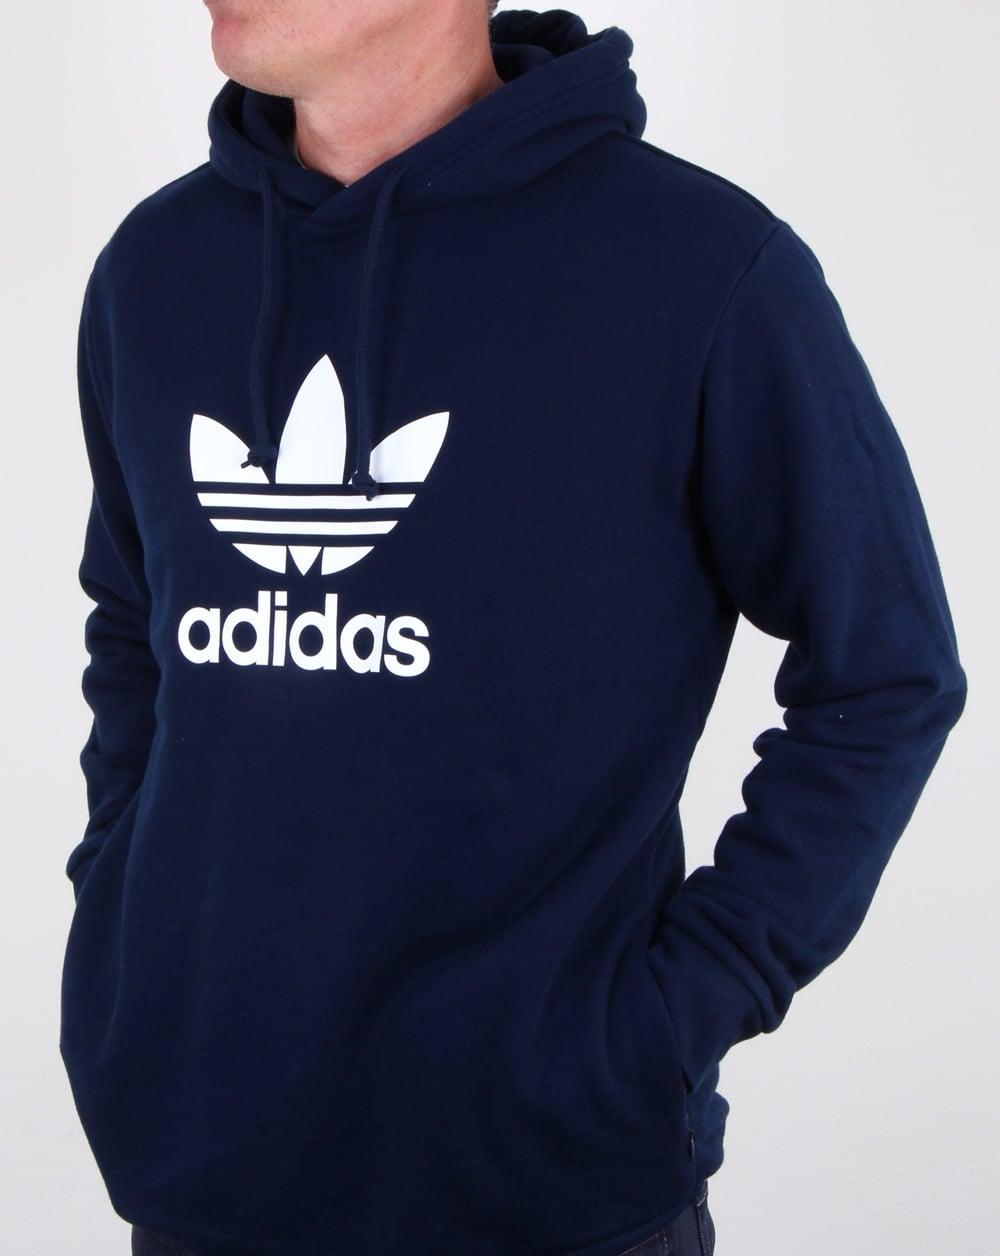 adidas Originals Trefoil Hoodie | Schwarz | Pullover Hoodies